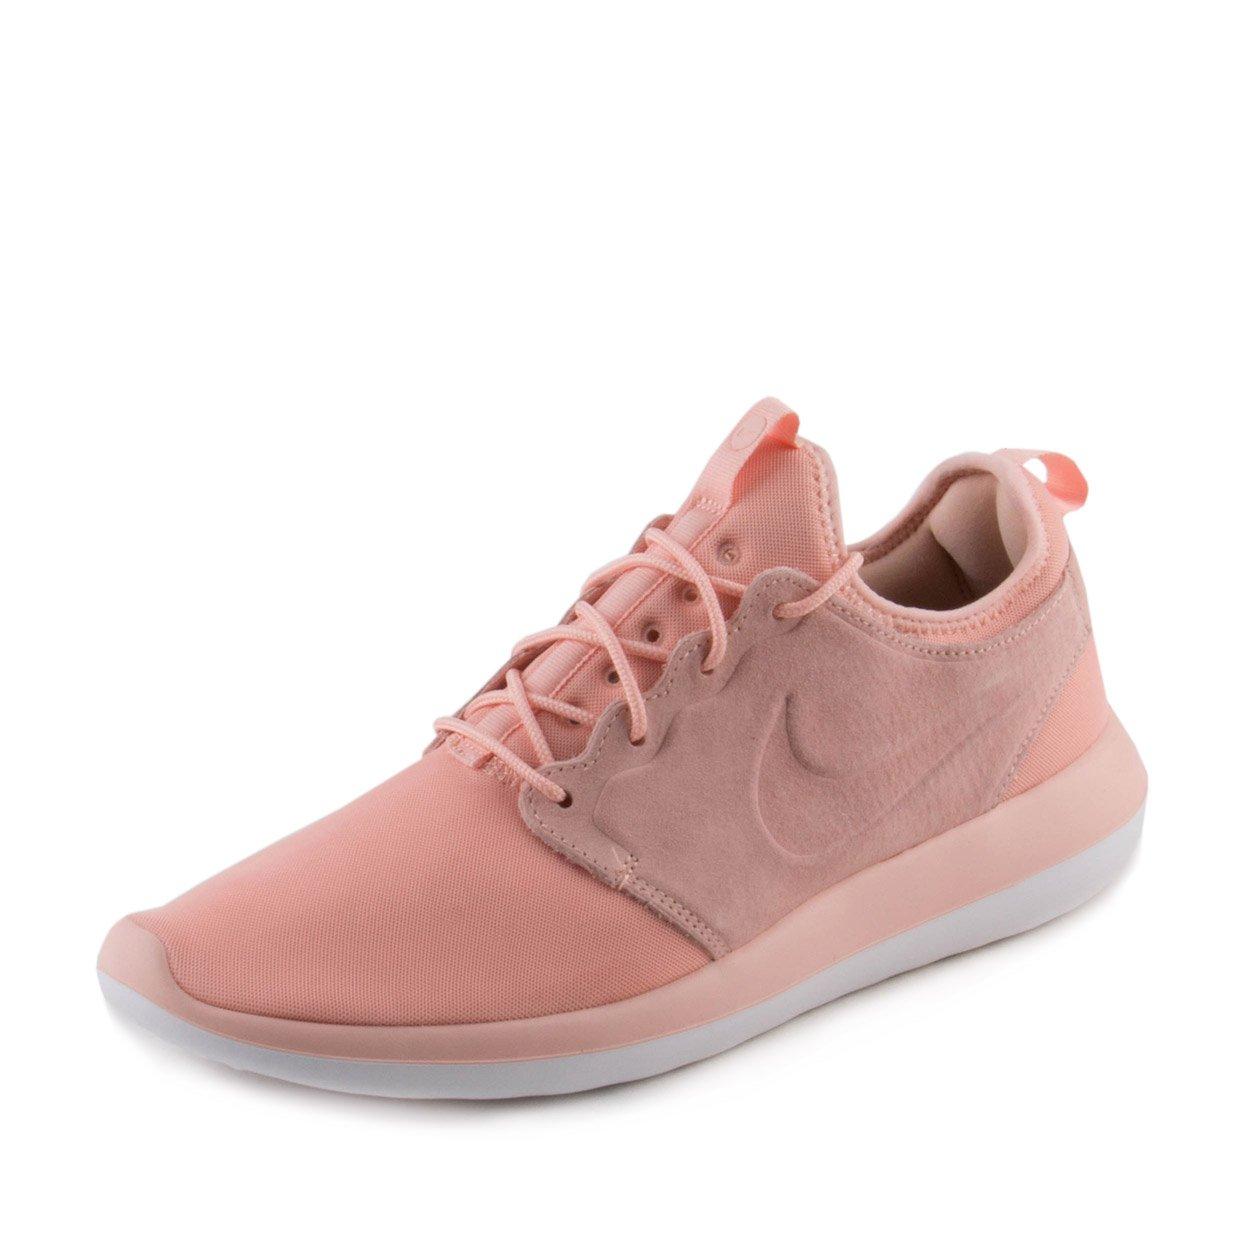 pretty nice a6589 80439 Nike Mens Roshe Two BR Artic Orange Nylon Size 12